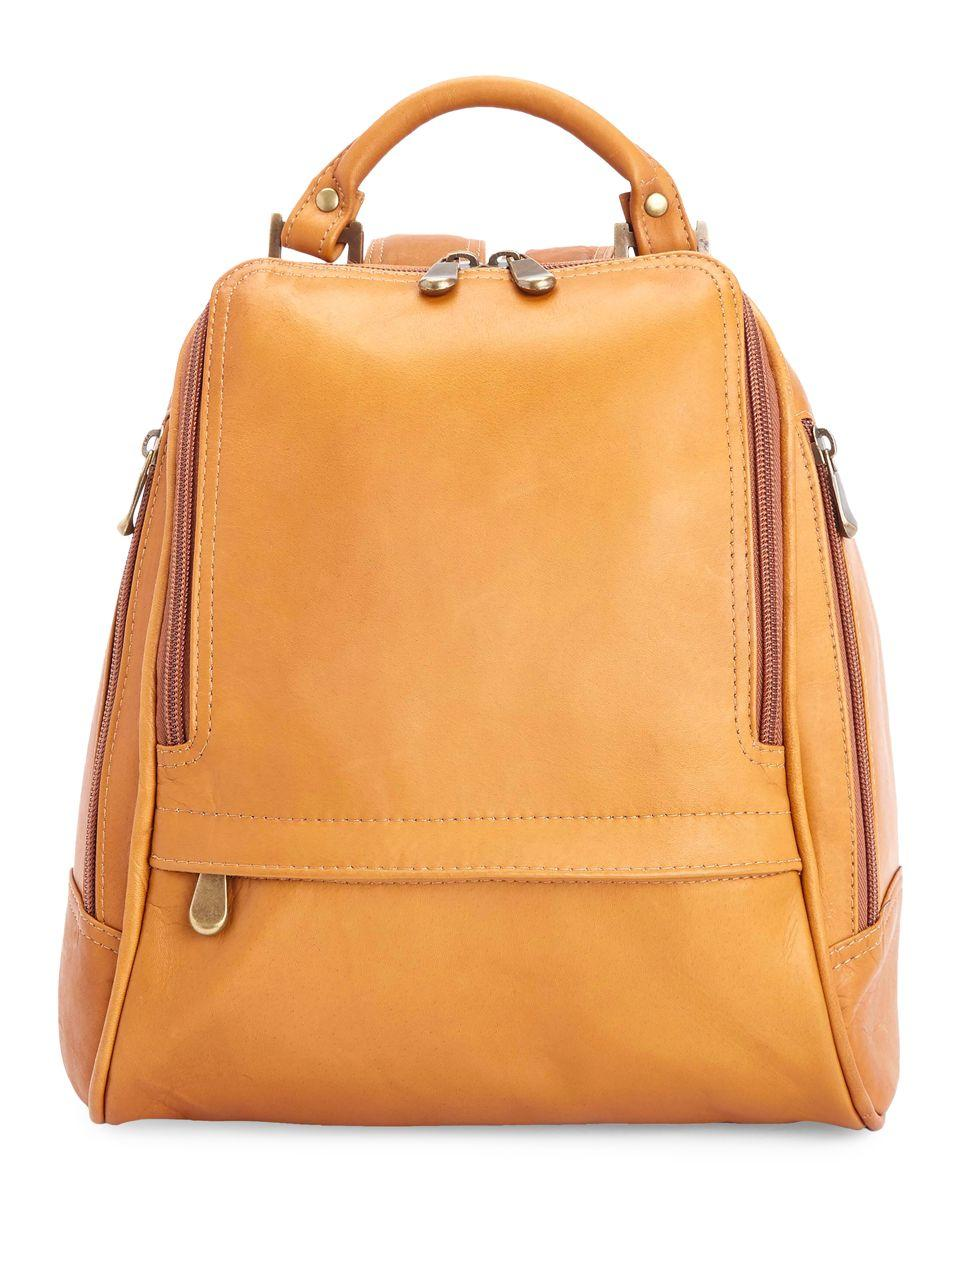 royce new york sling backpack in natural lyst. Black Bedroom Furniture Sets. Home Design Ideas